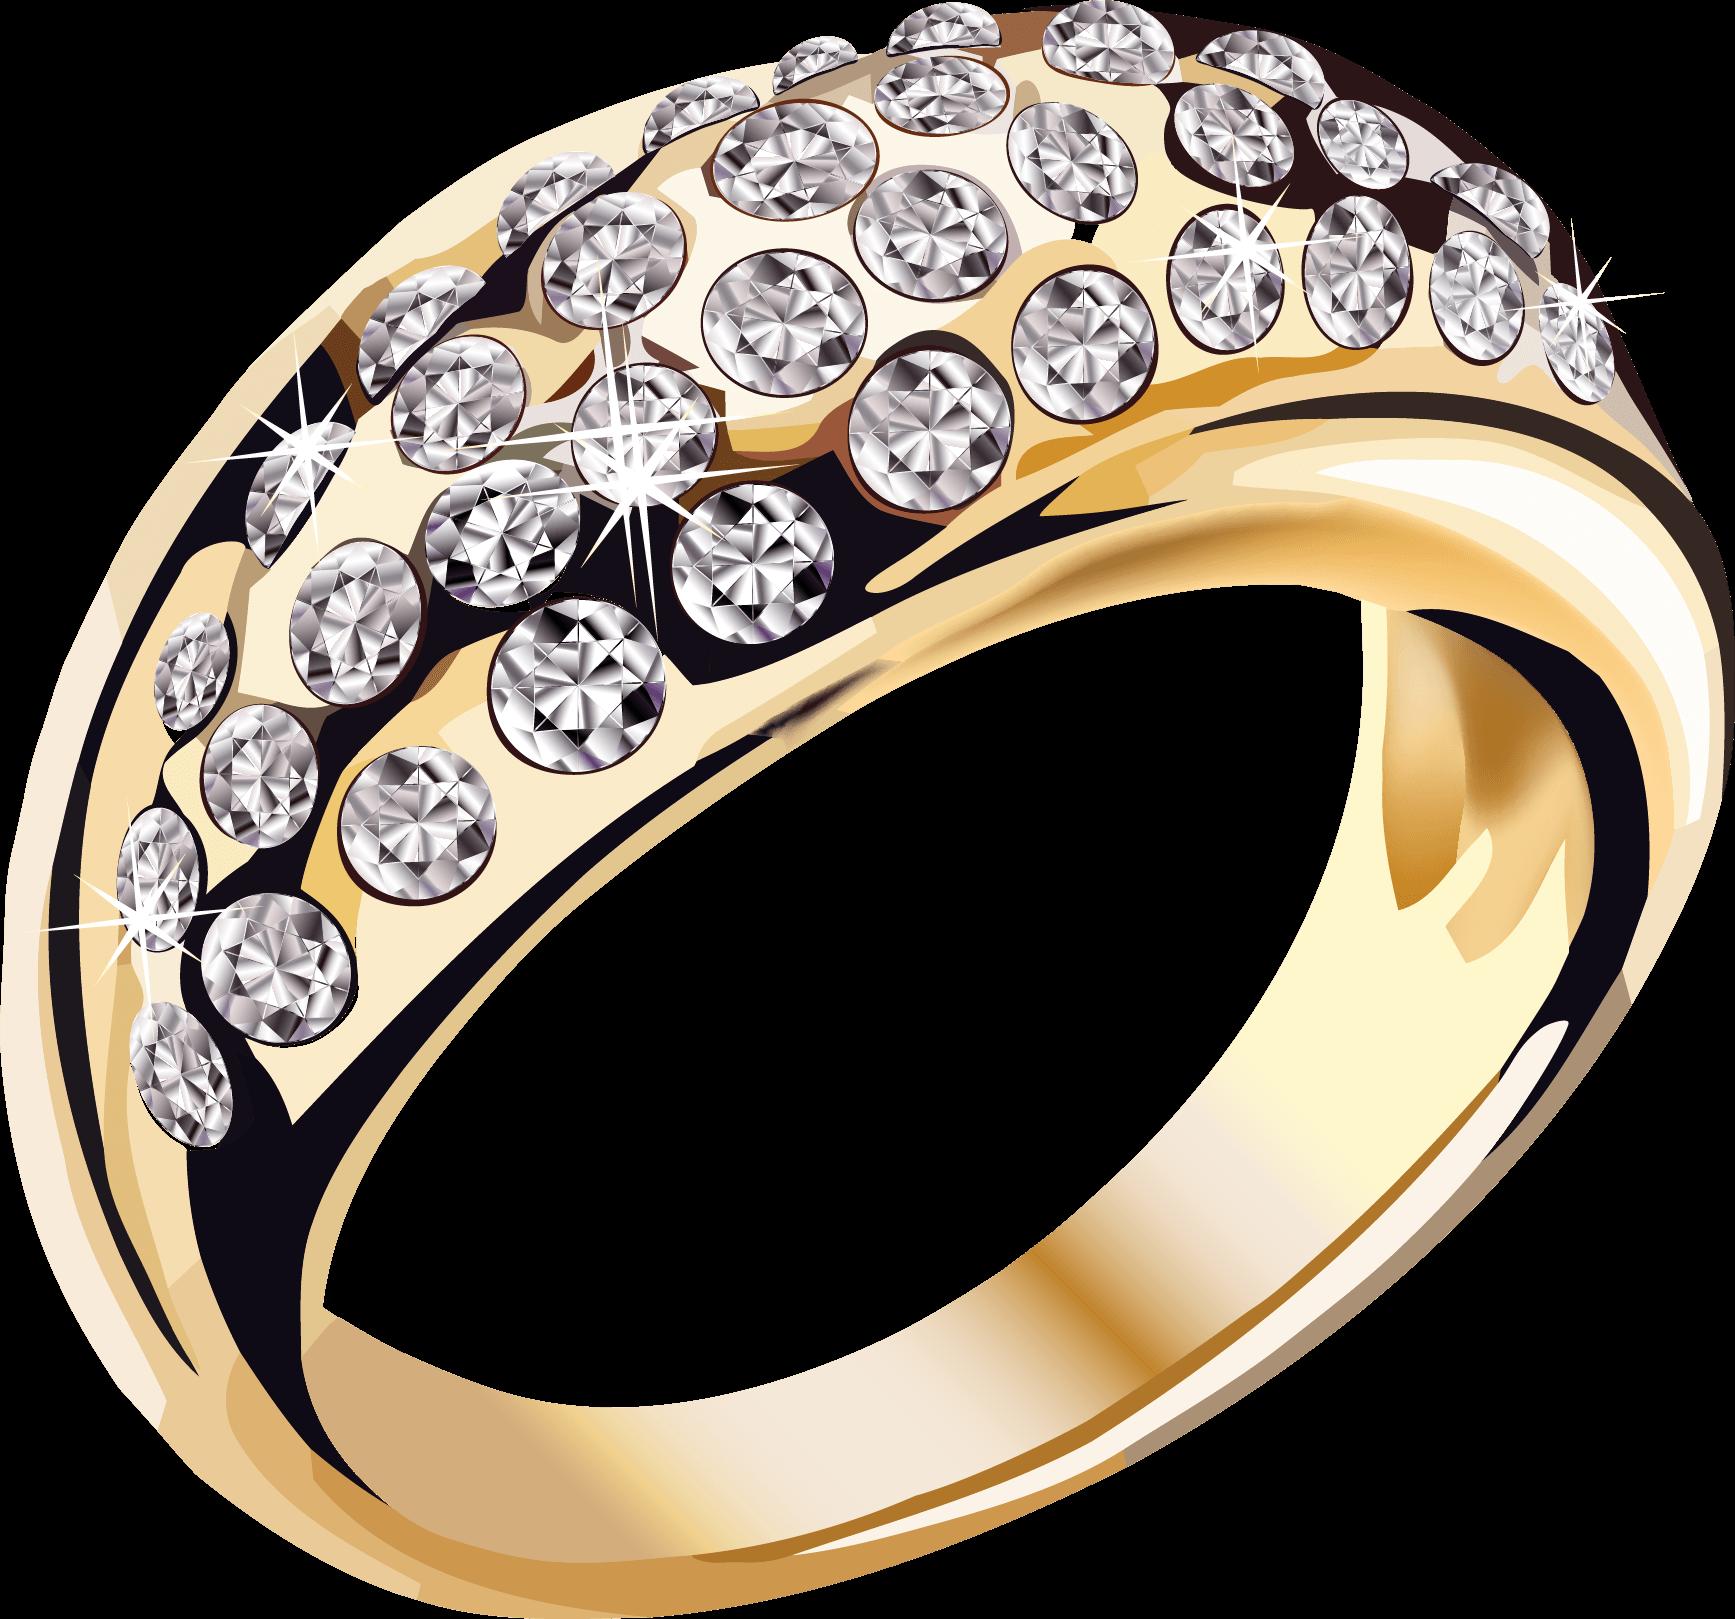 Wedding crown clipart clip art free Cartoon Crown Clipart transparent PNG - StickPNG clip art free